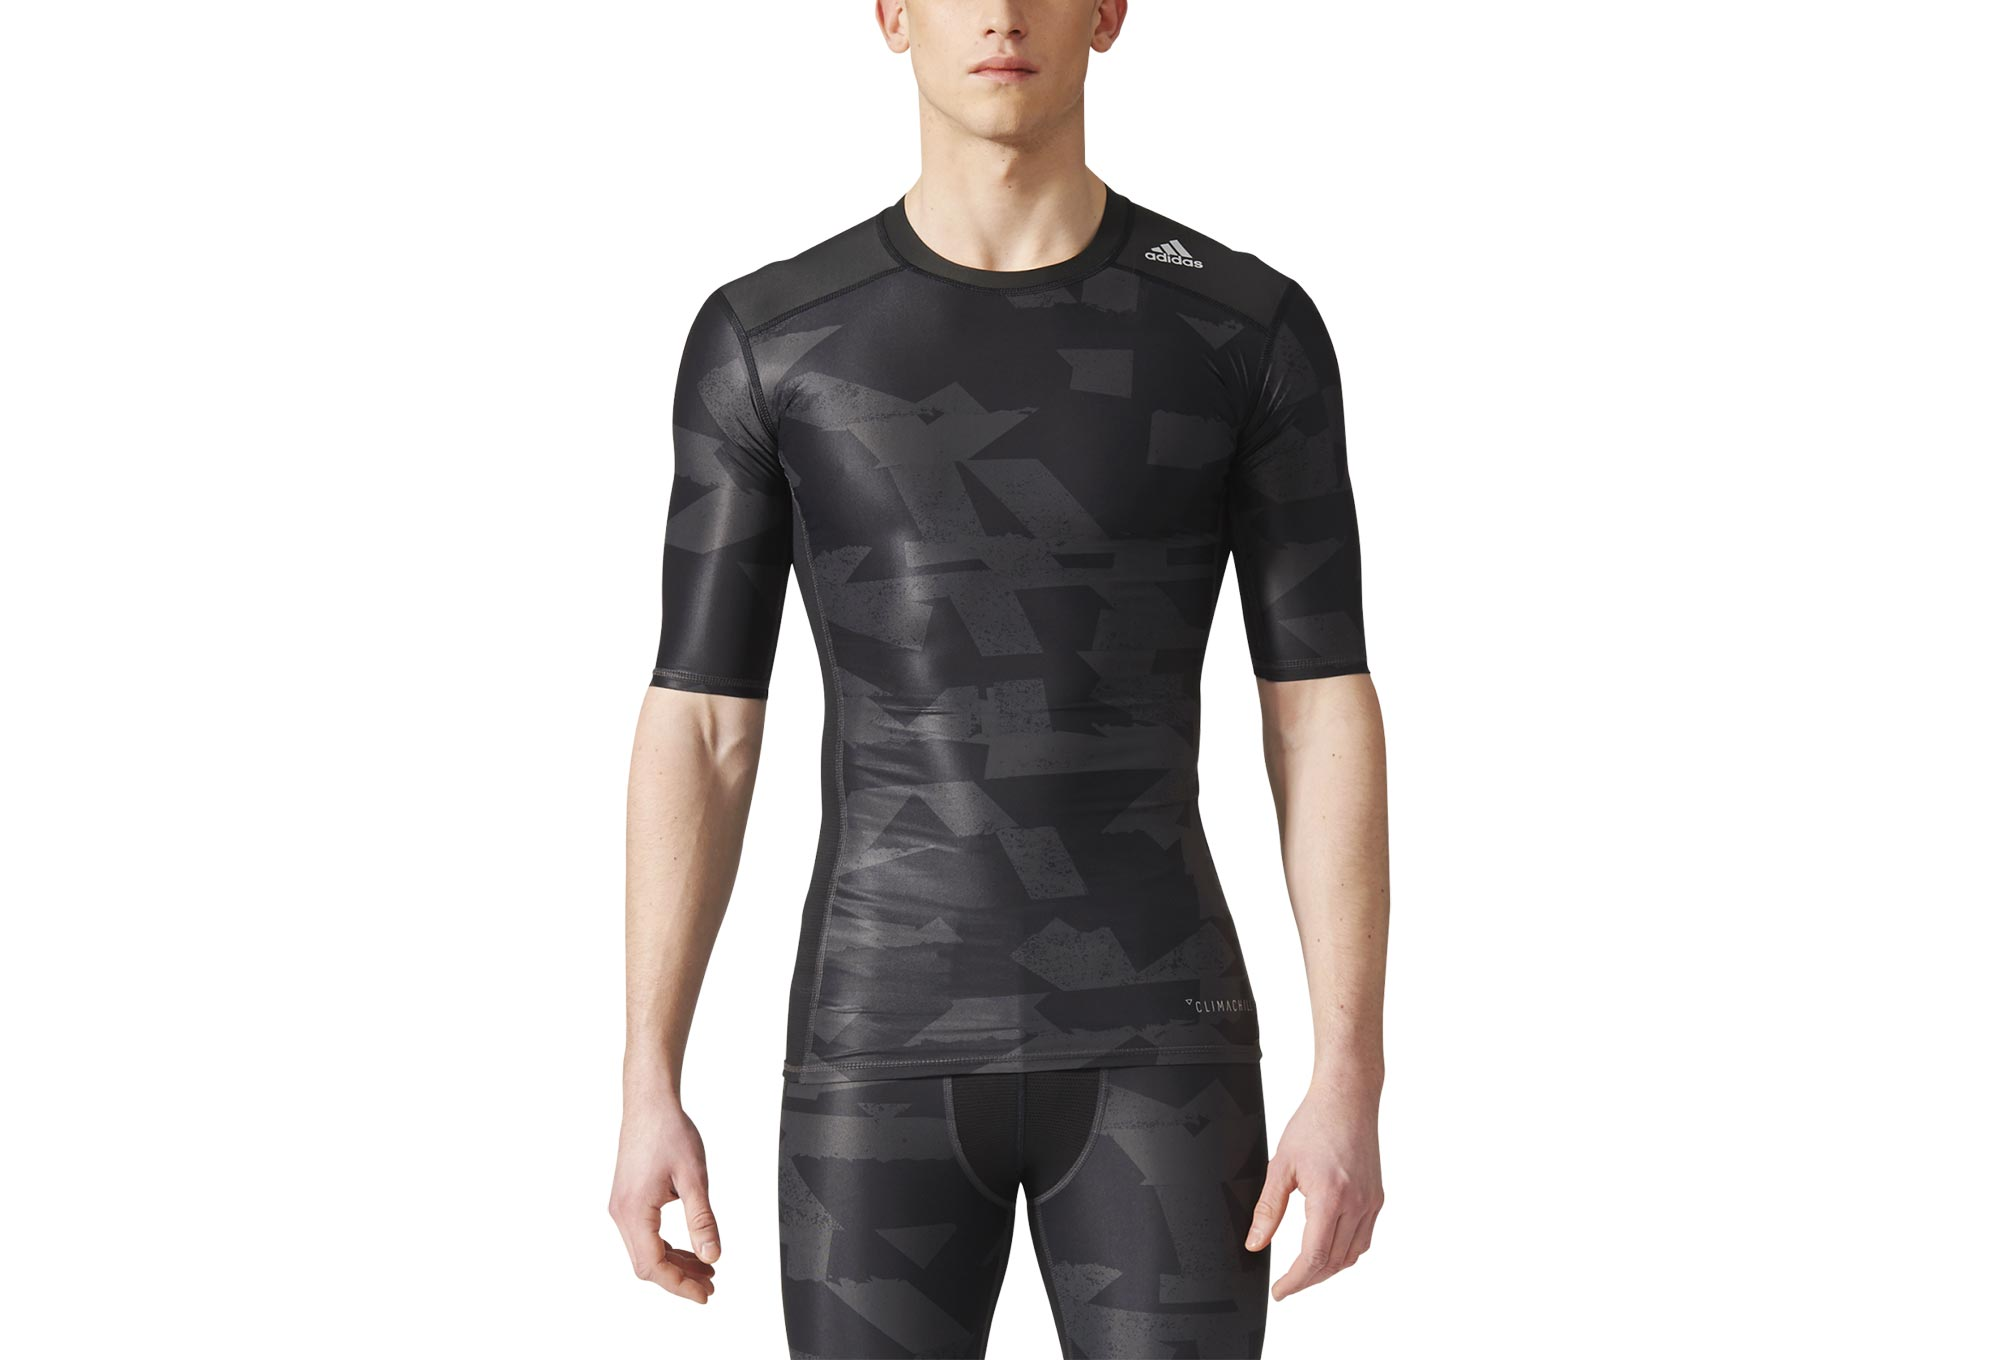 2b3557972211 adidas running Techfit Chill Print Short Sleeve Jersey Black Grey ...